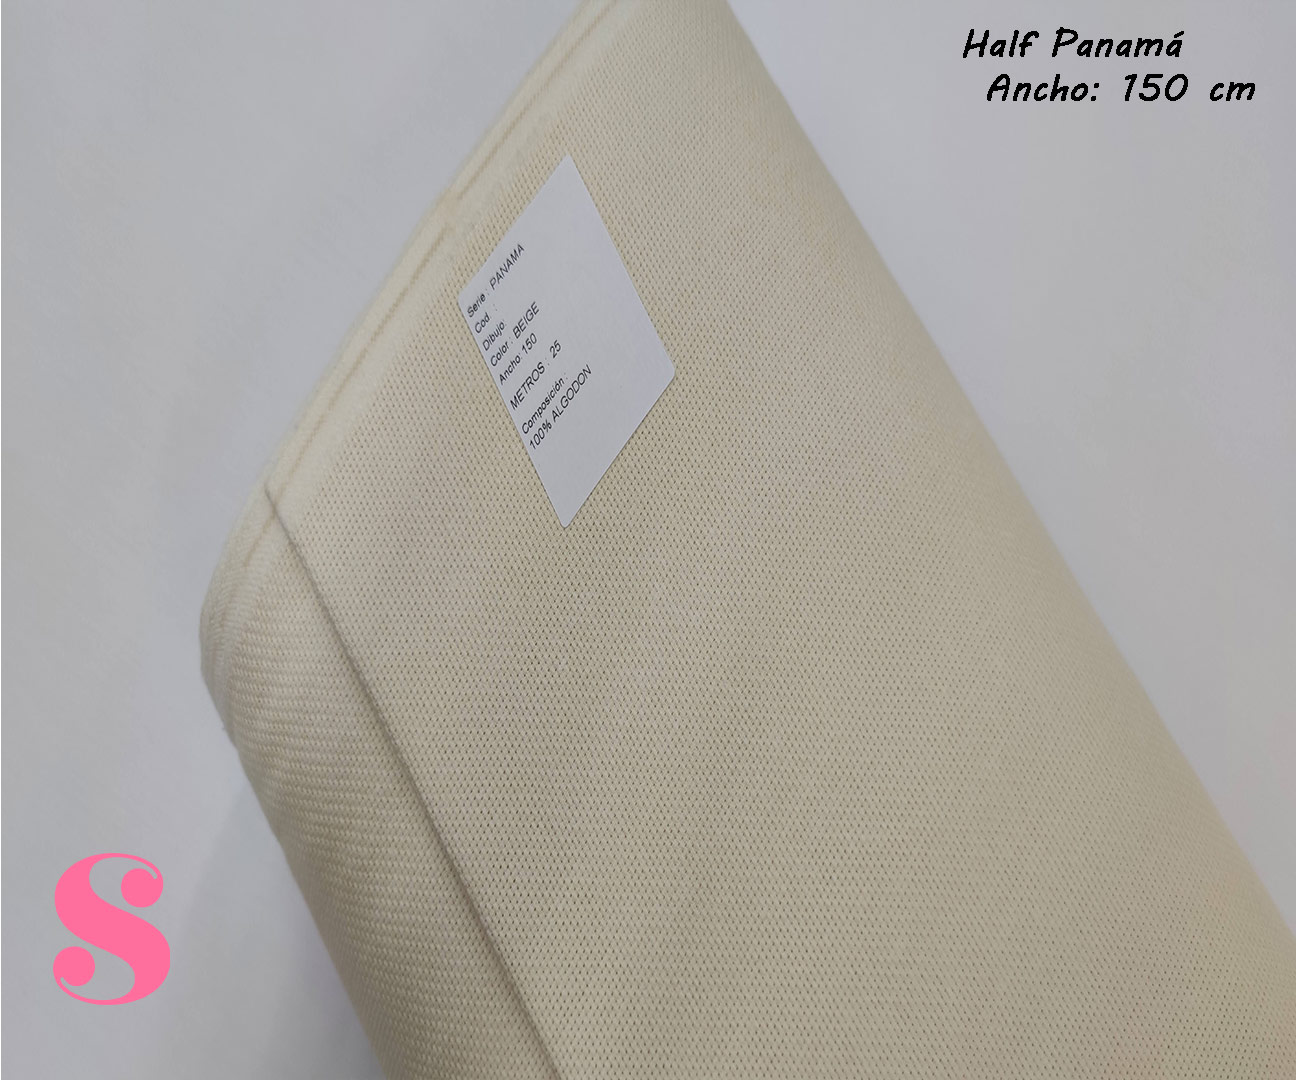 beige-mantel-half-panama-antimanchas-navidad-algodon, Tejido Panamá Beige